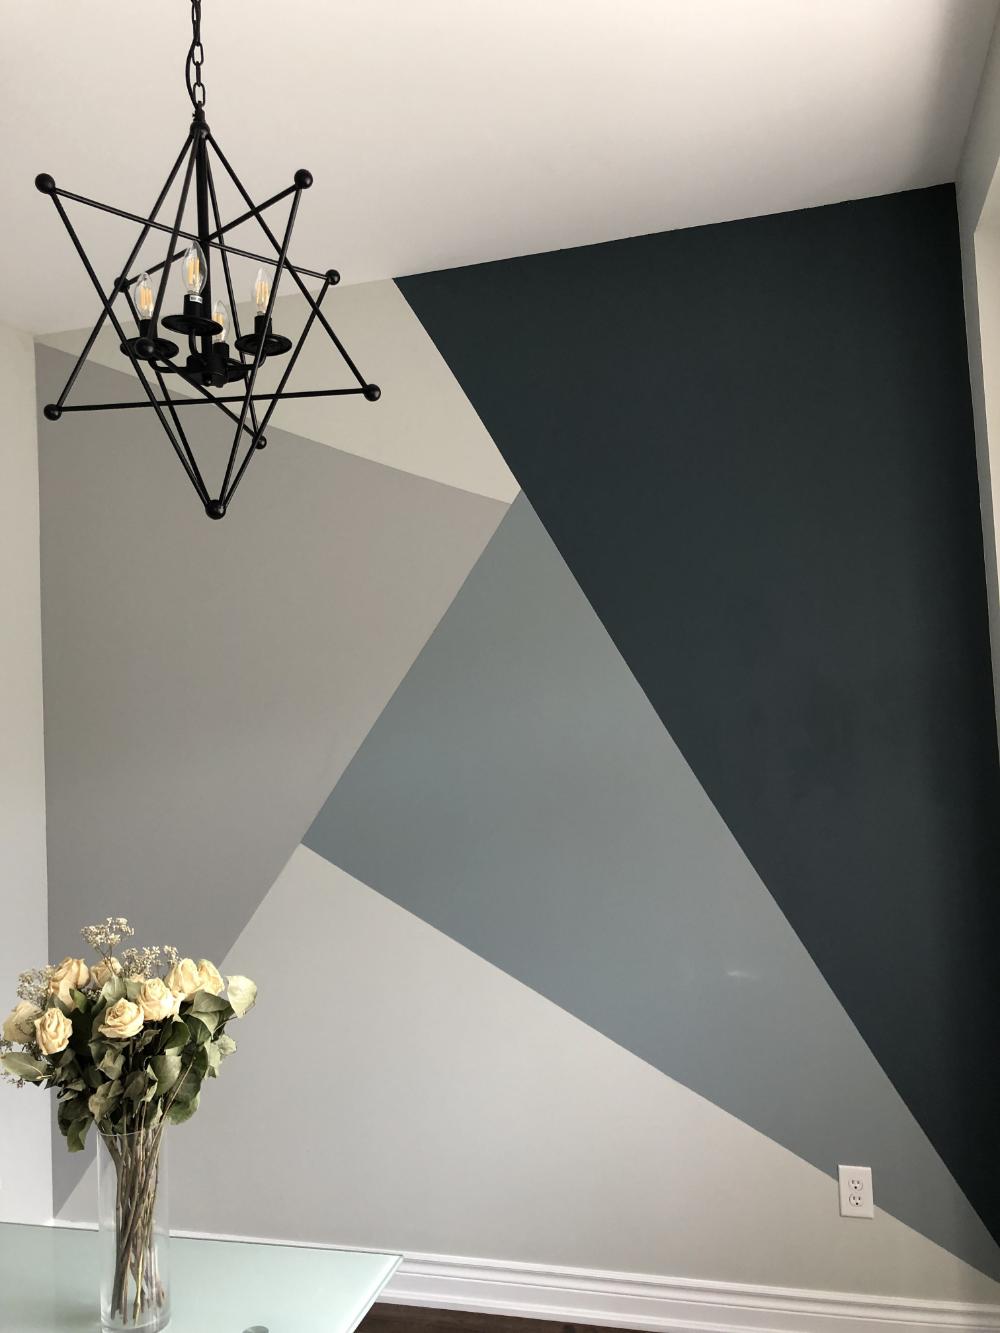 Fontenay Sous Bois Sophie Pinheiro Buzztmz Buzztmz Accentwall Yozgat Accent Wall Bedroom Paint Geometric Wall Paint Bedroom Wall Paint